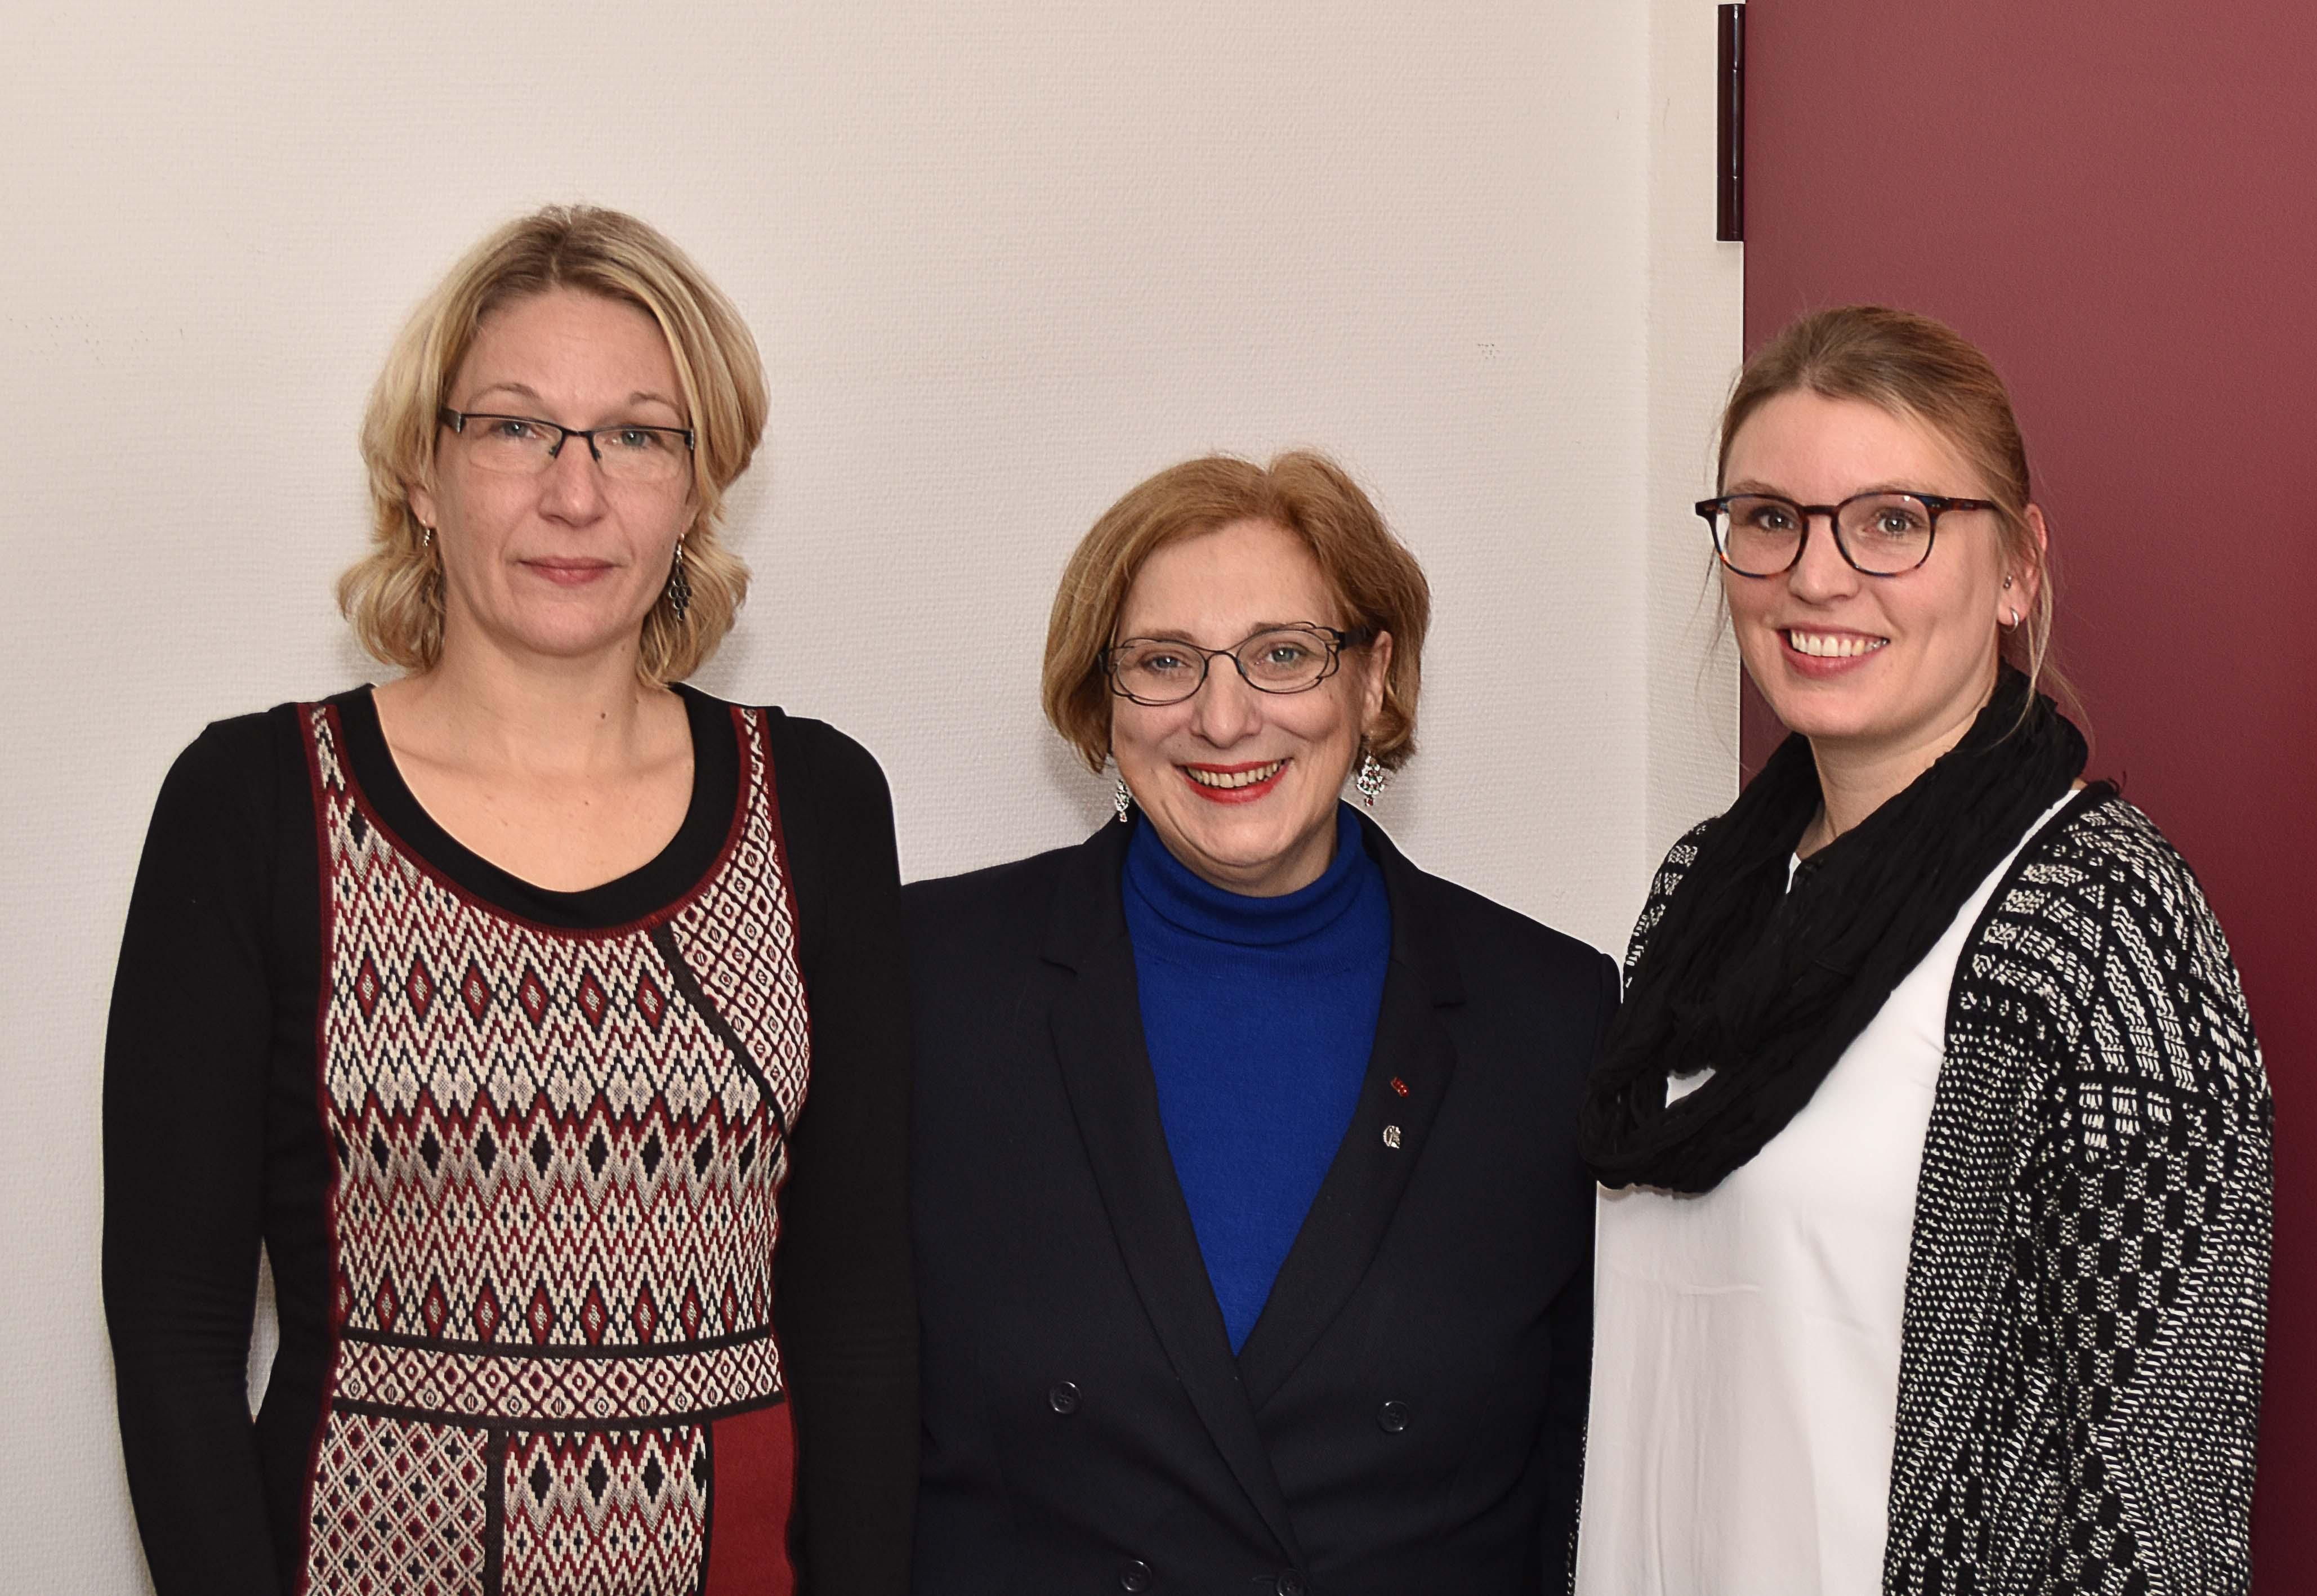 V.l.n.r.: Schulleiterin Melanie Eßer, SPD-Bundestagsabgeordnete Dr. Daniela De Ridder und Alexandra Faust